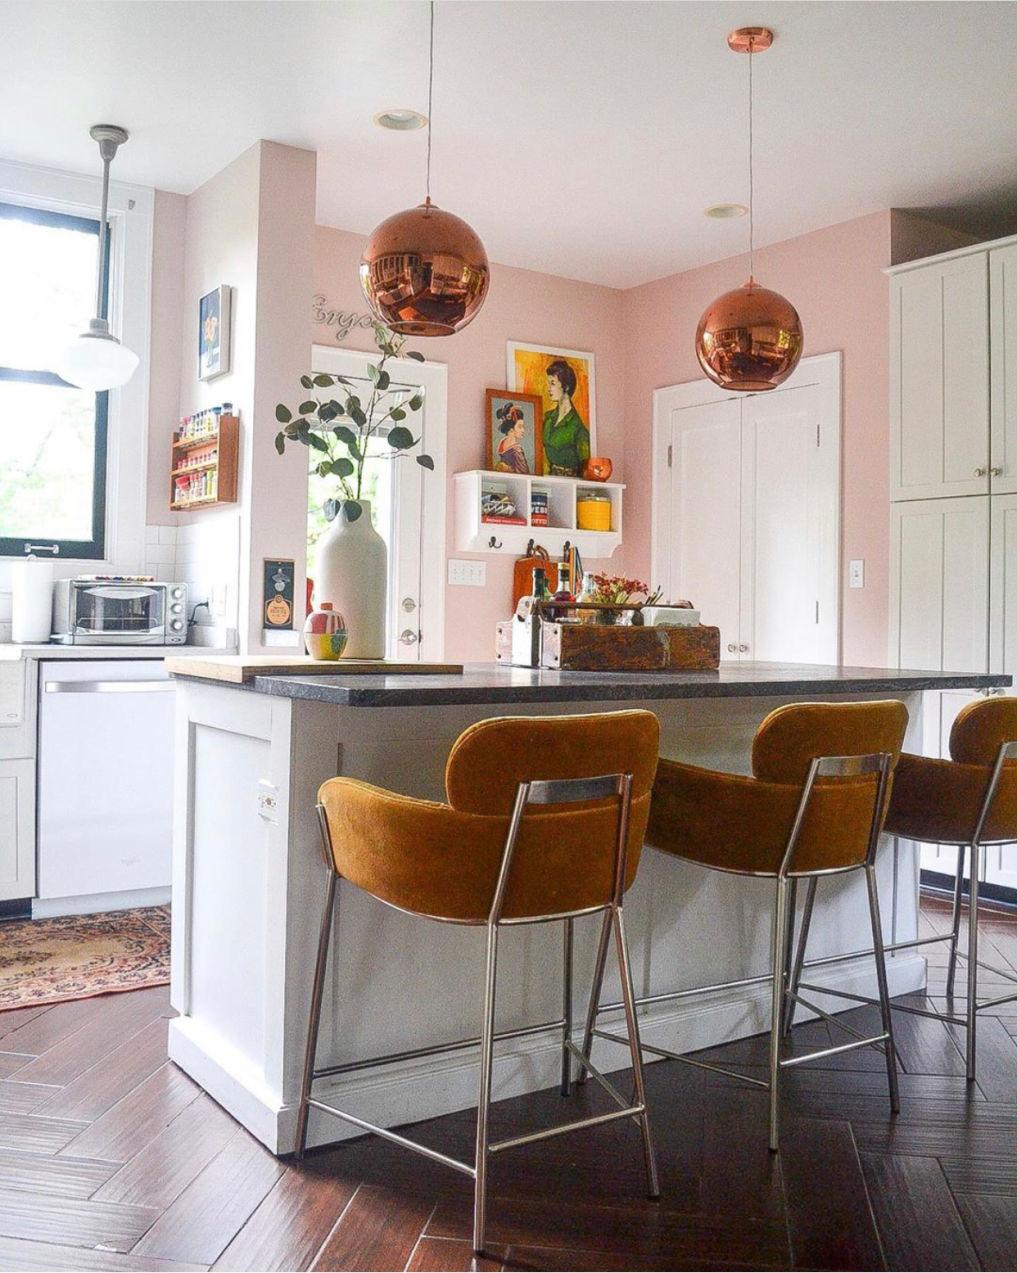 Blue pink kitchen with white cabinets and brass lighting #kitchen #bohokitchen #blushpink #pinkkitchen #whitekitchen #eclectickitchen #kitchendecor